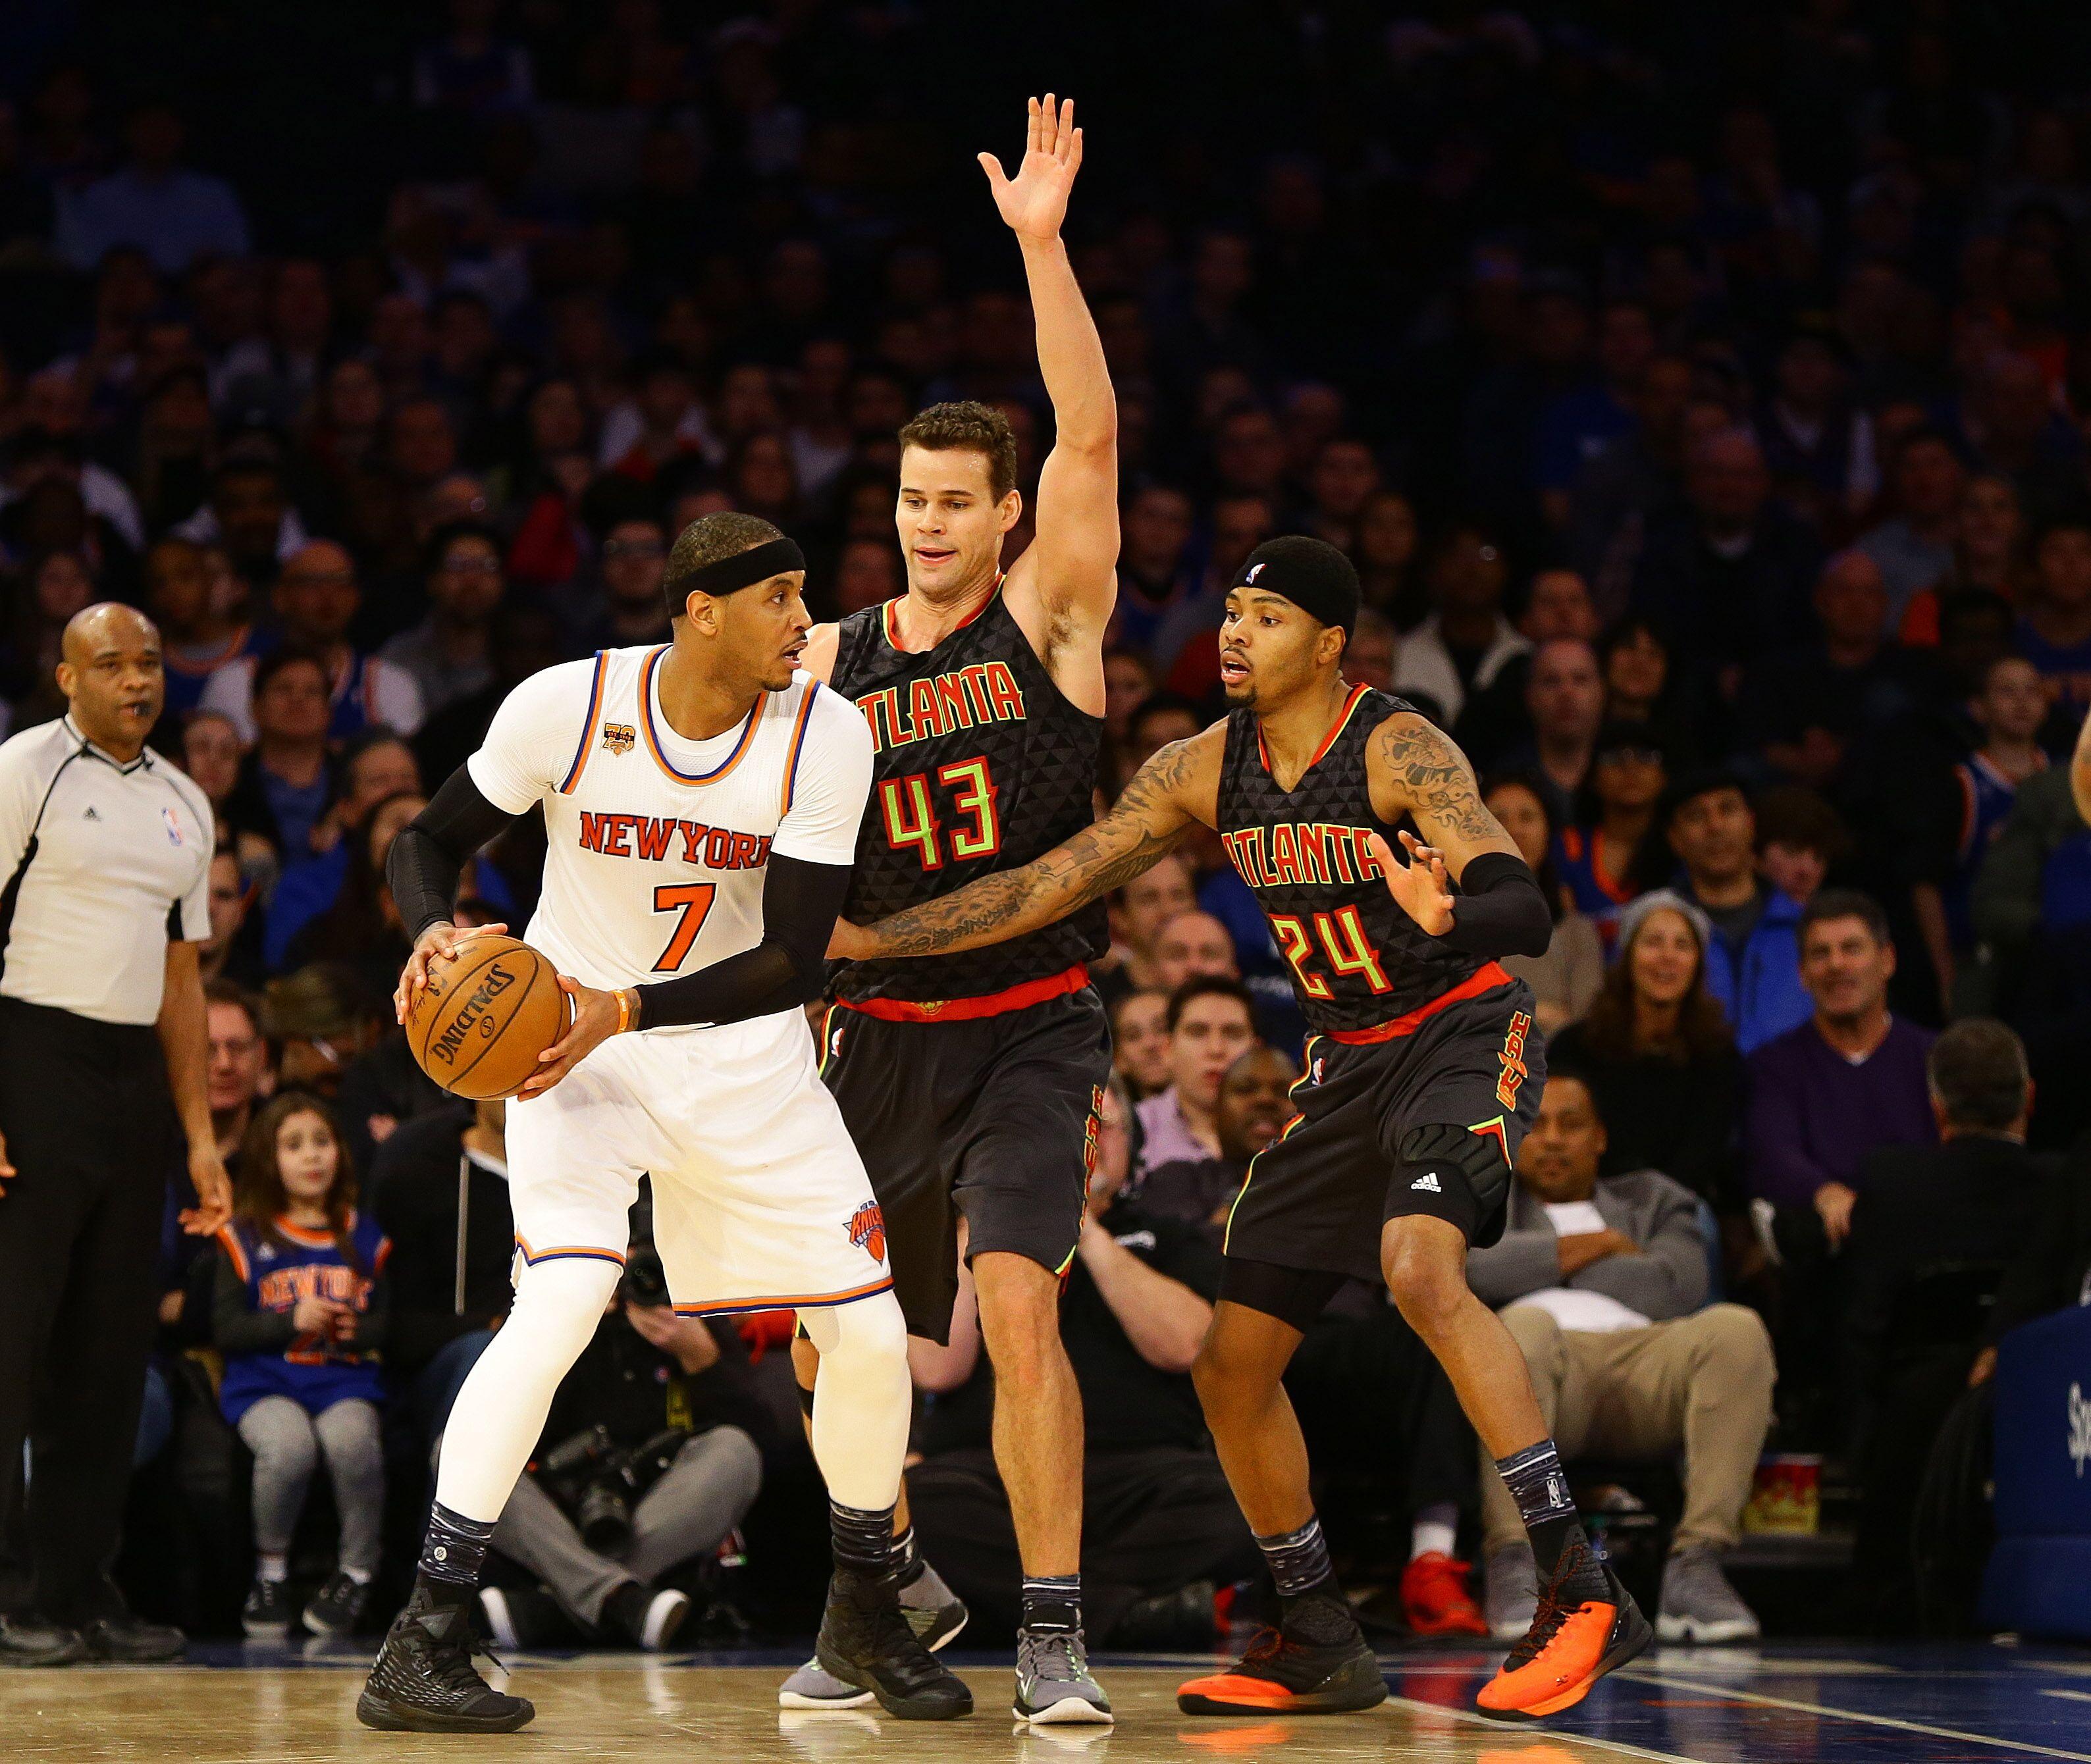 New York Knicks vs Atlanta Hawks Live Stream: Watch NBA Online